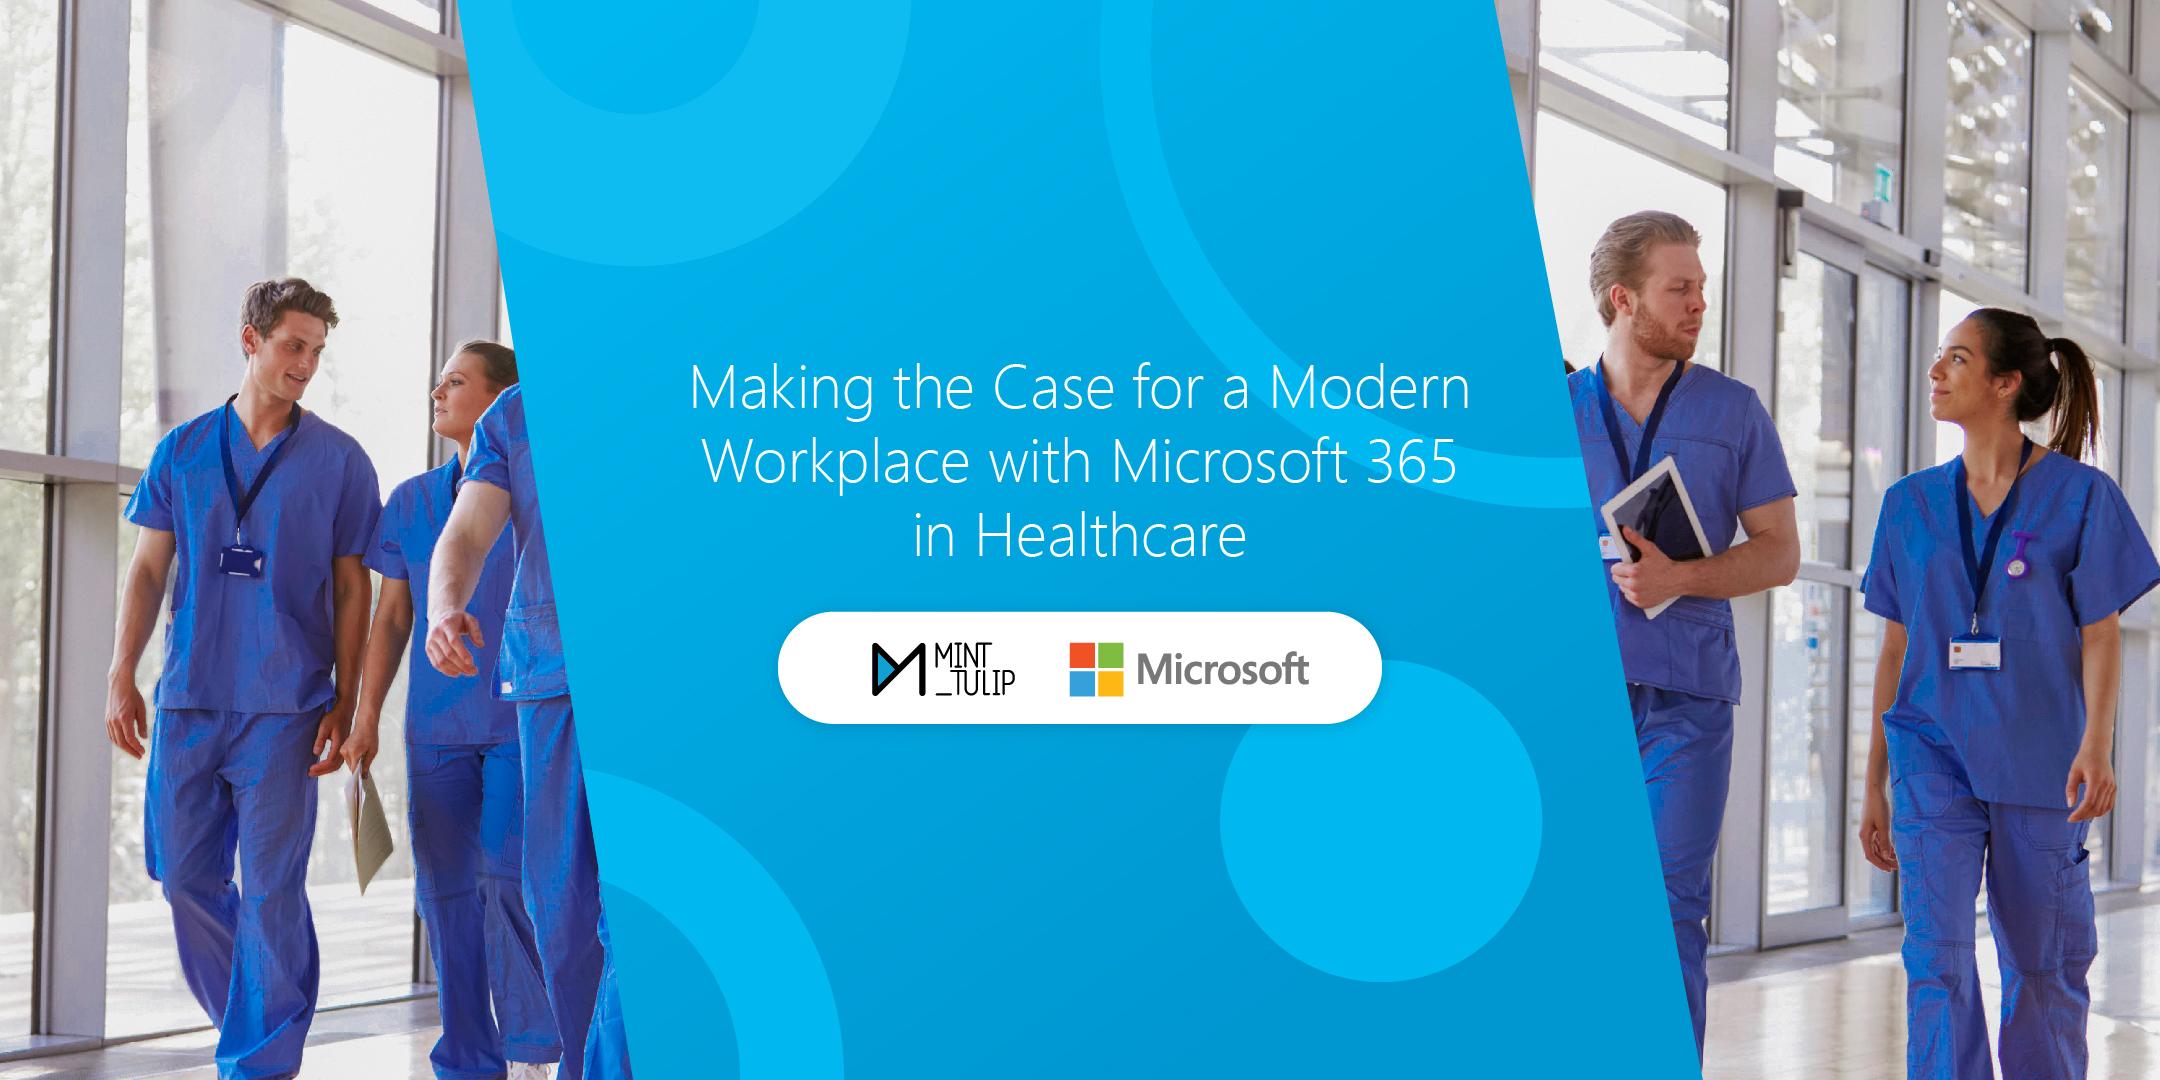 Splash title with Minttulip and Microsoft logos